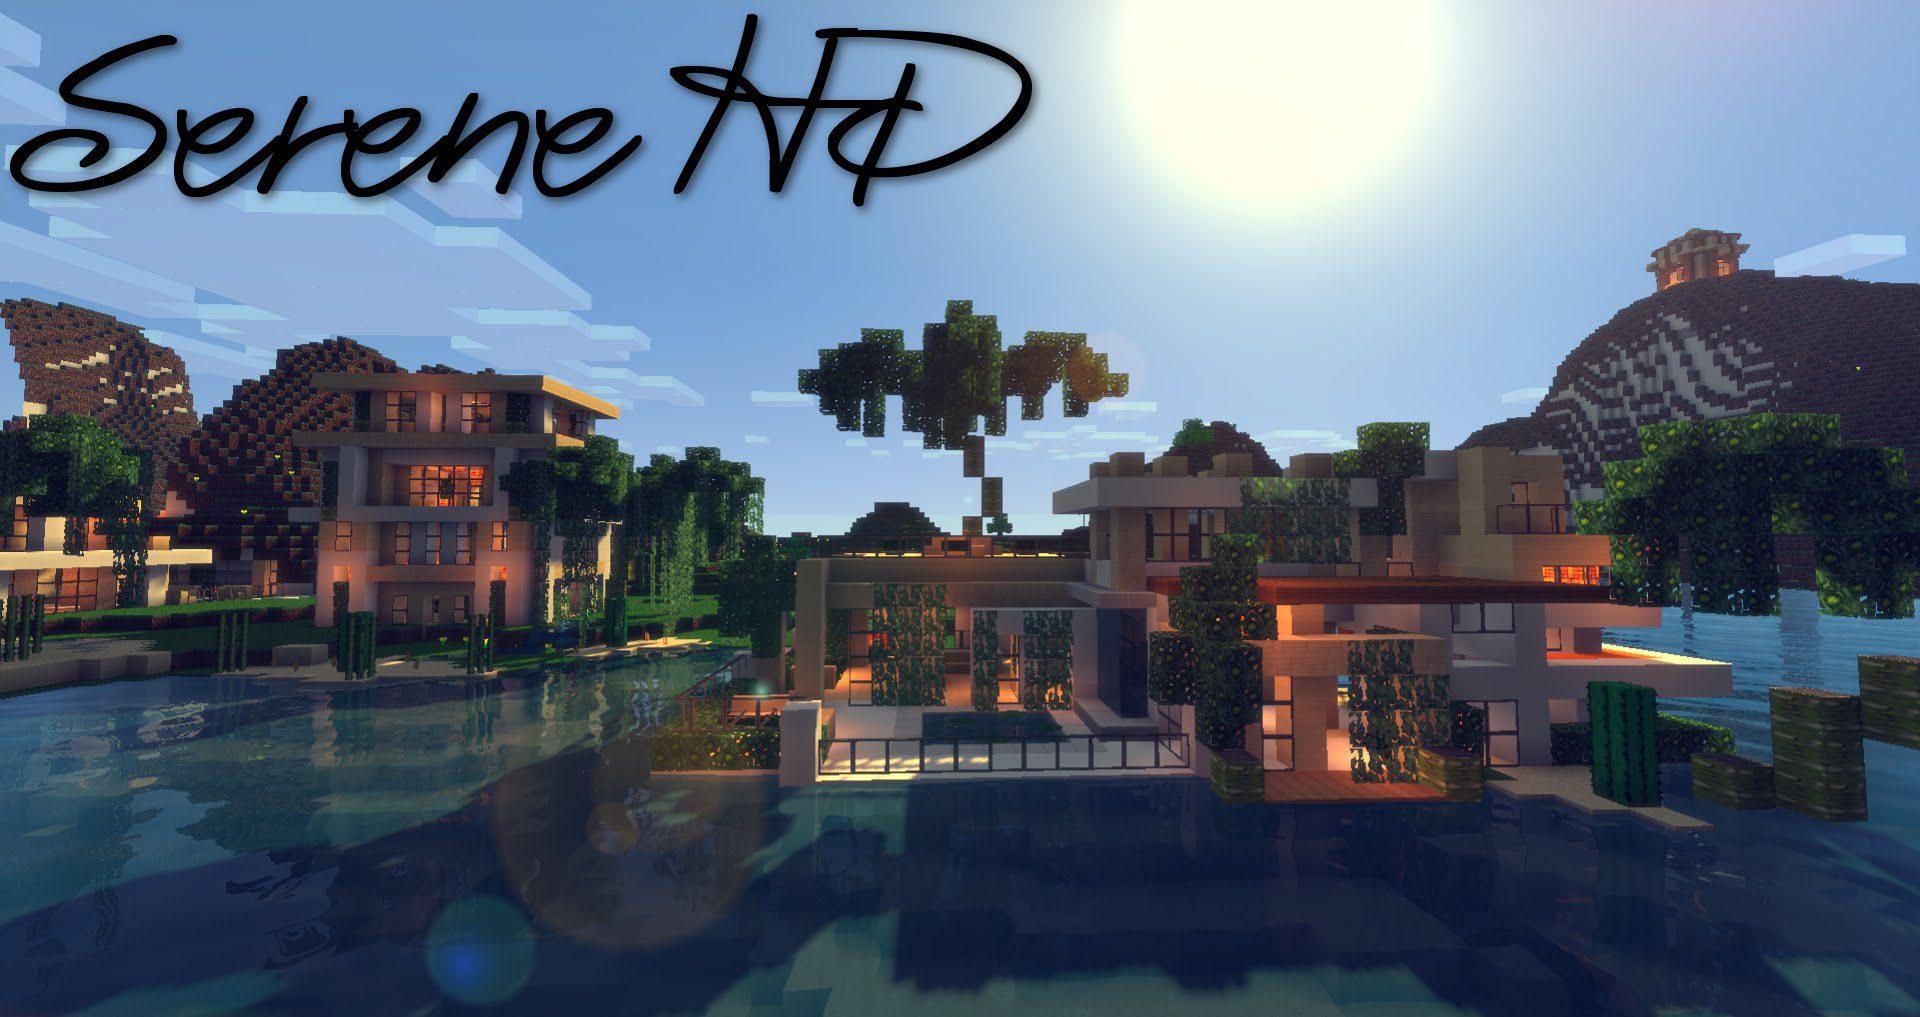 Minecraft Texture Pack Hd 10.1010.10 - Gambleh g